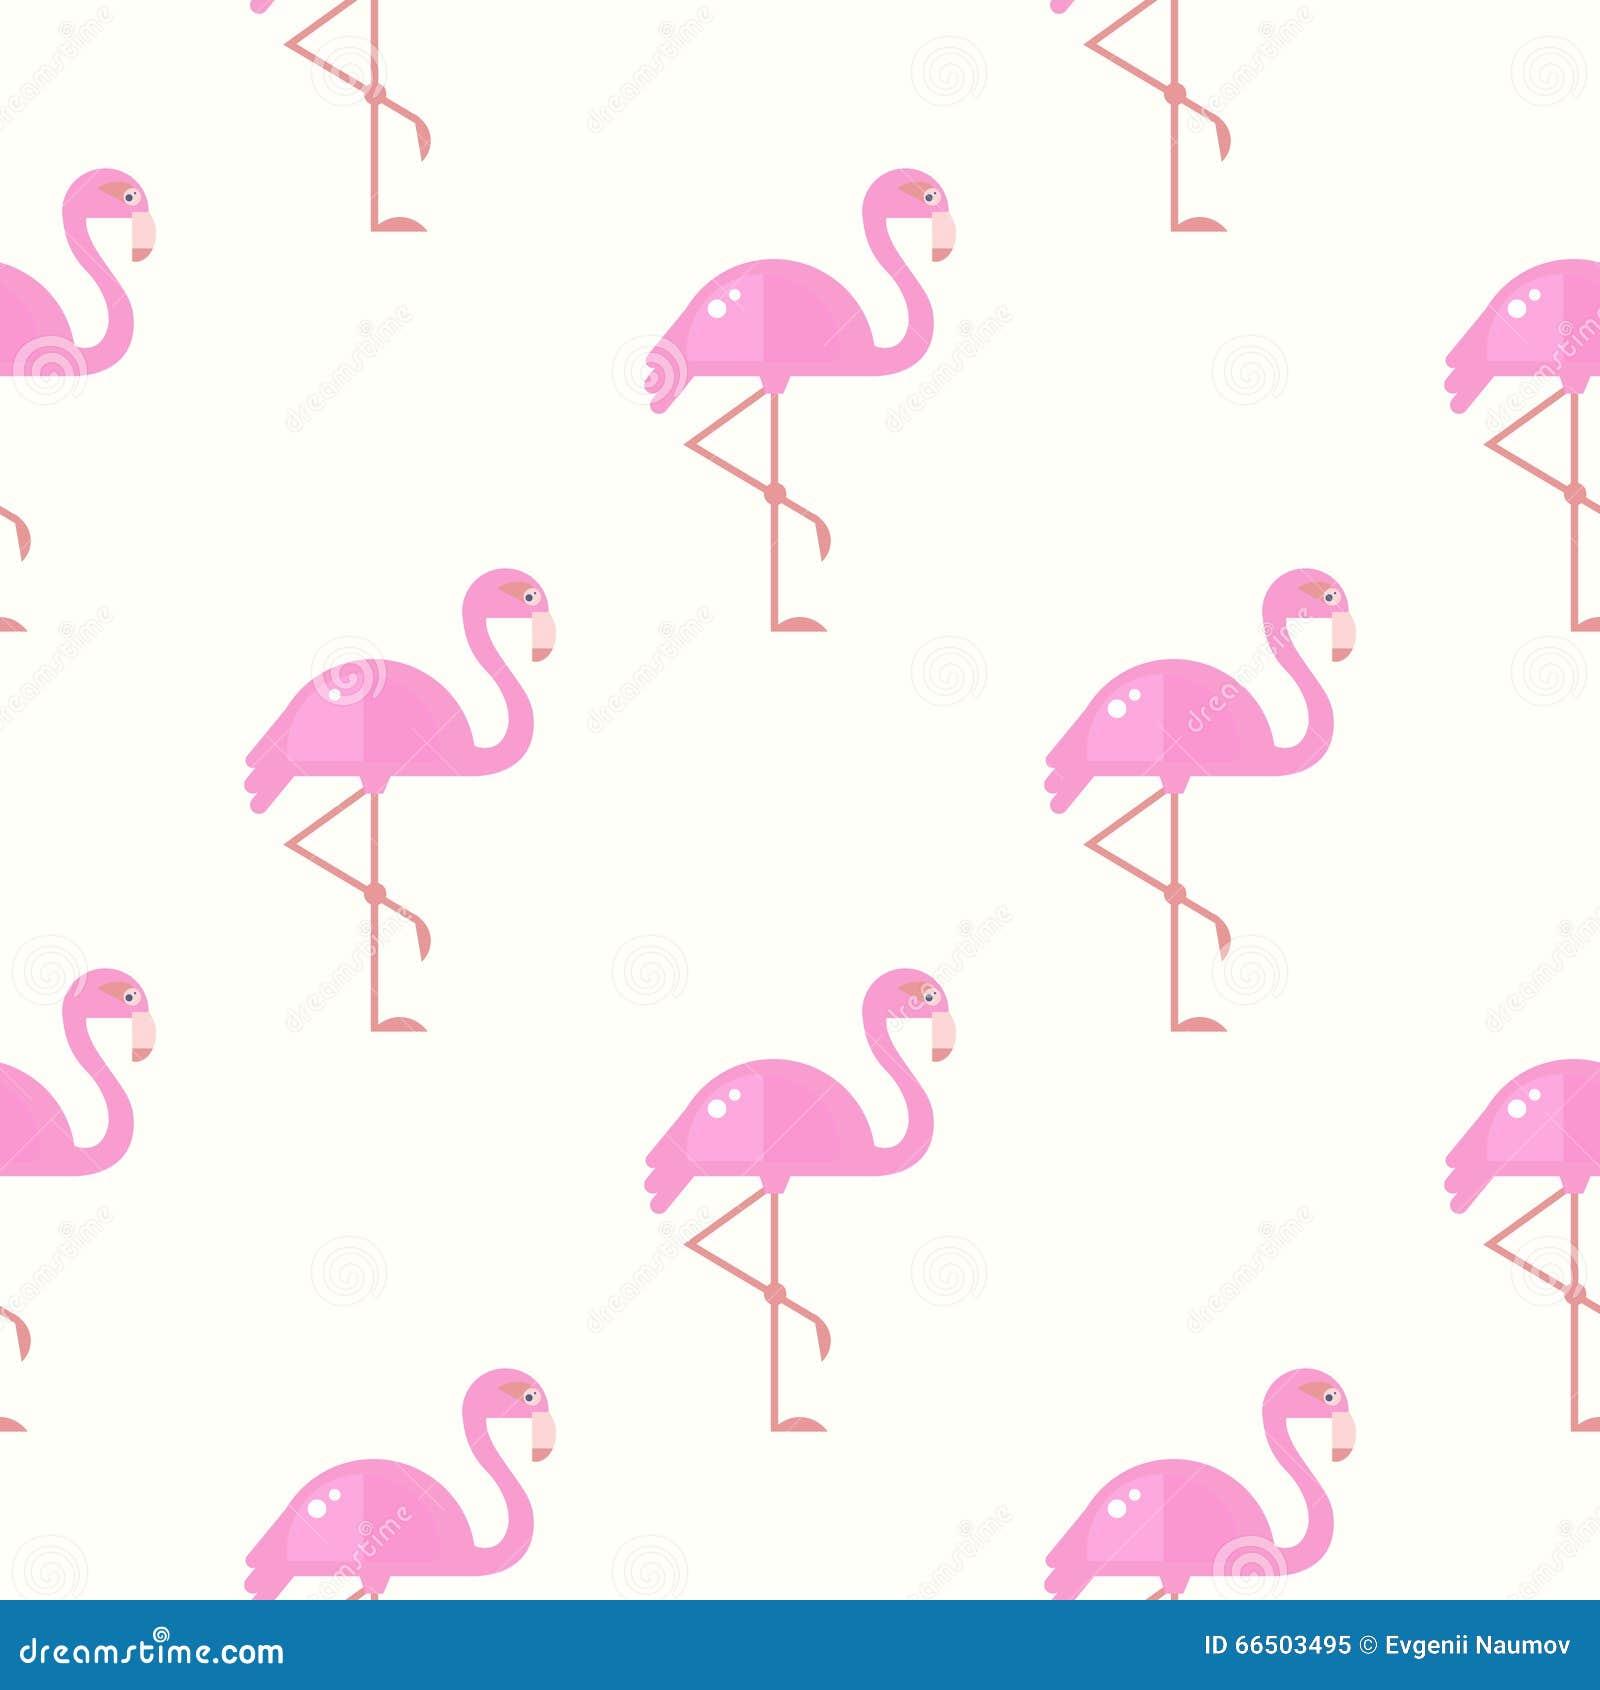 Flamingo Bird Background Retro Seamless Pattern In Vector